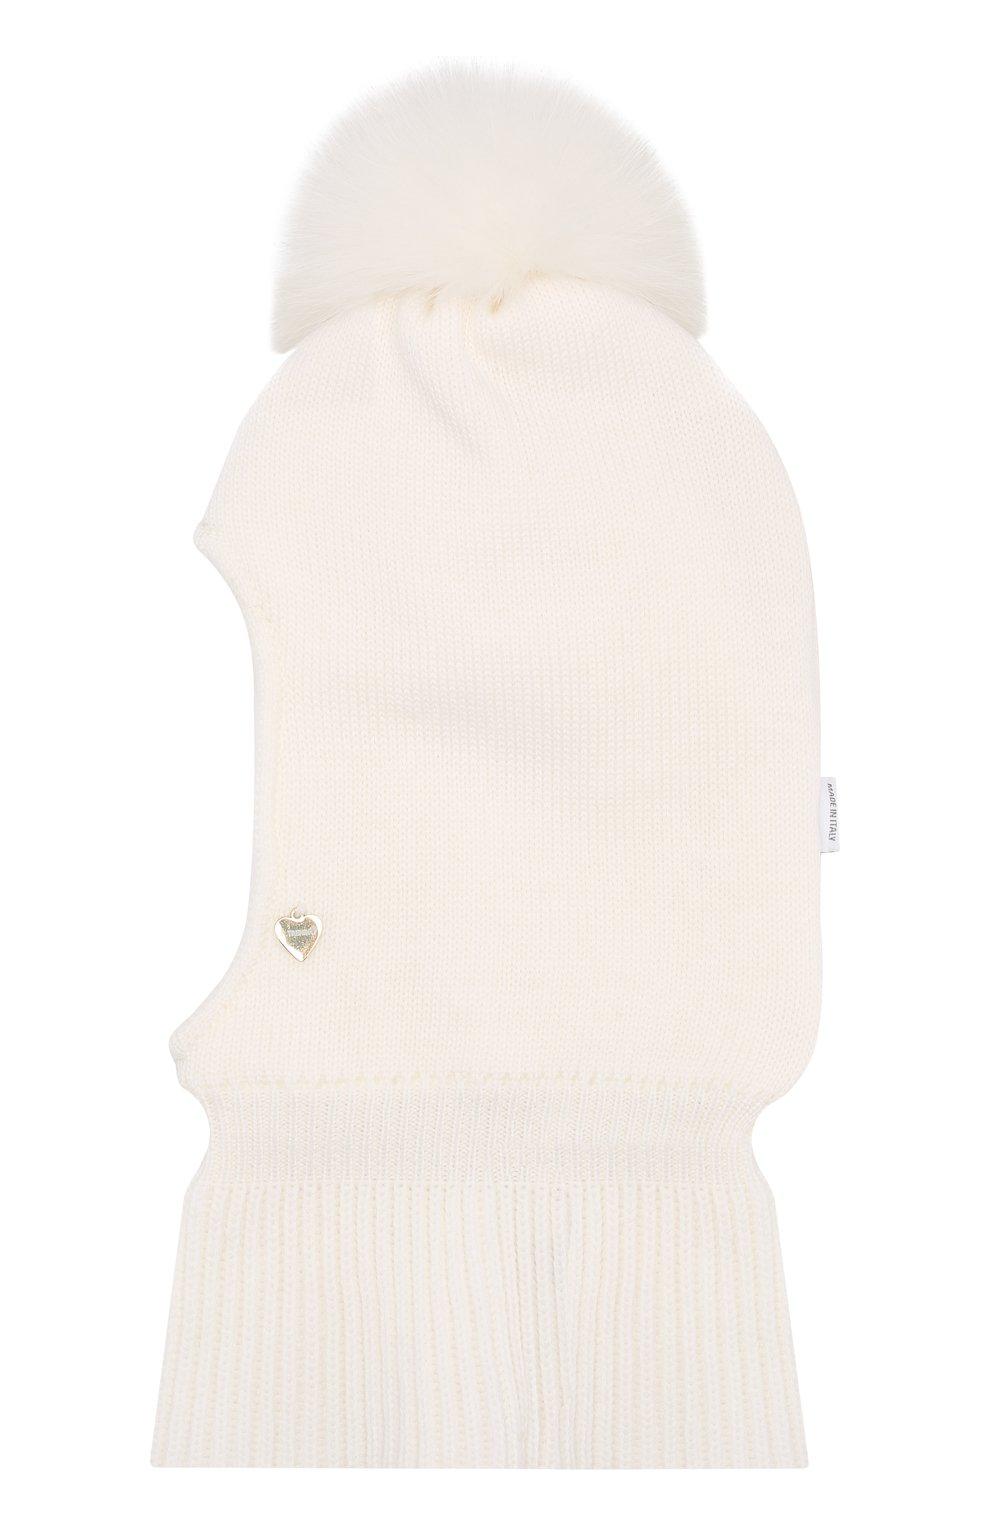 Детского шерстяная шапка-балаклава IL TRENINO белого цвета, арт. 18 4115/E0 | Фото 1